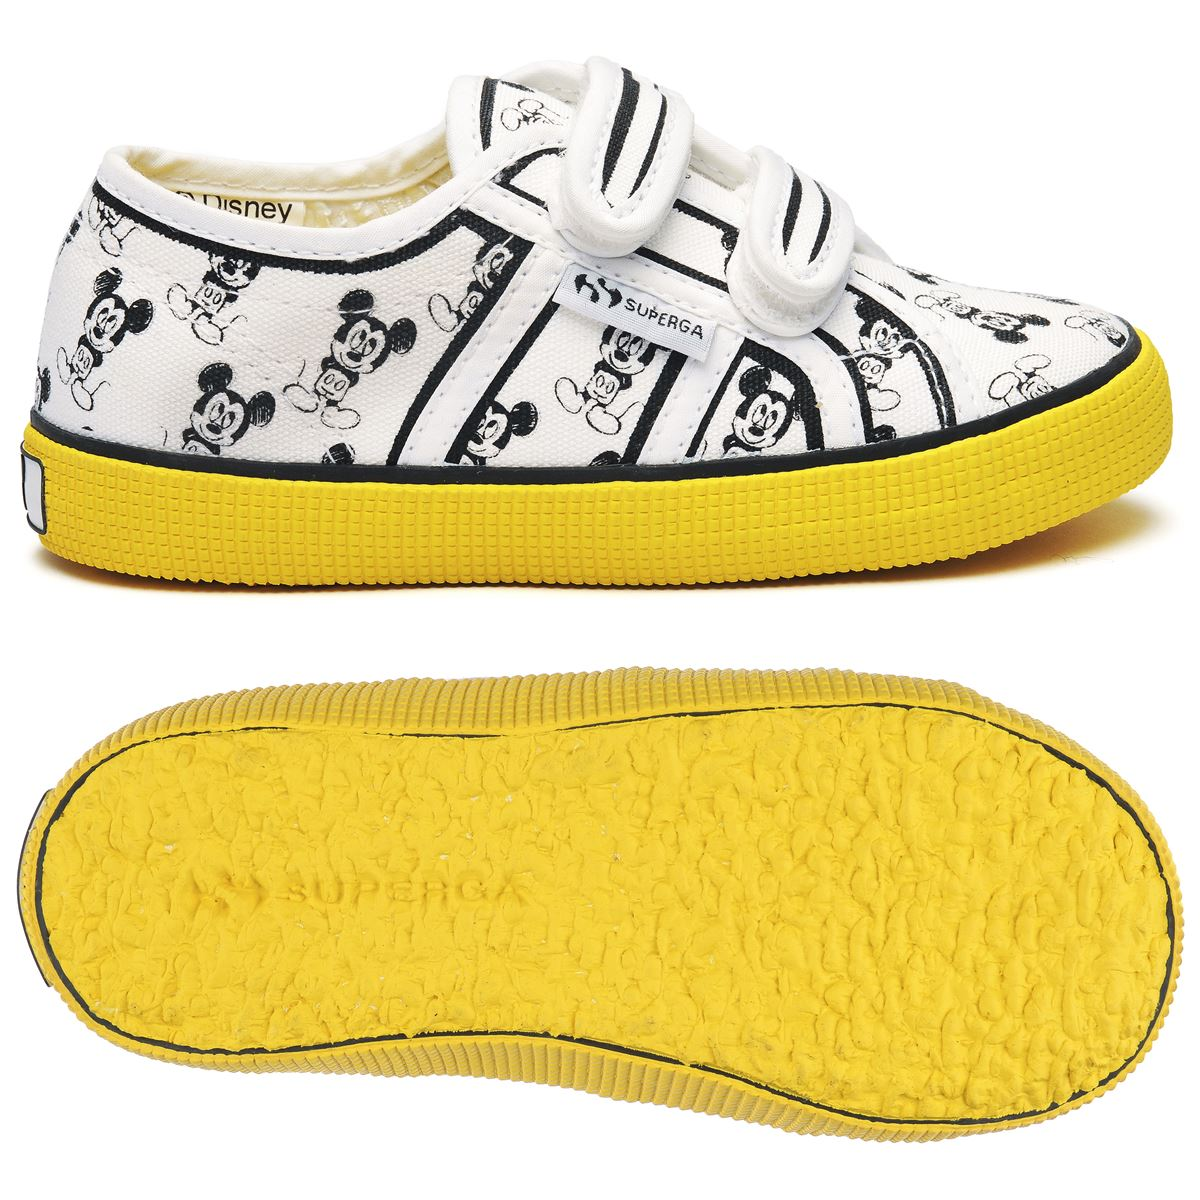 scarpe sportive 7b5fe e6b7d SUPERGA TOPOLINO - BIMBO